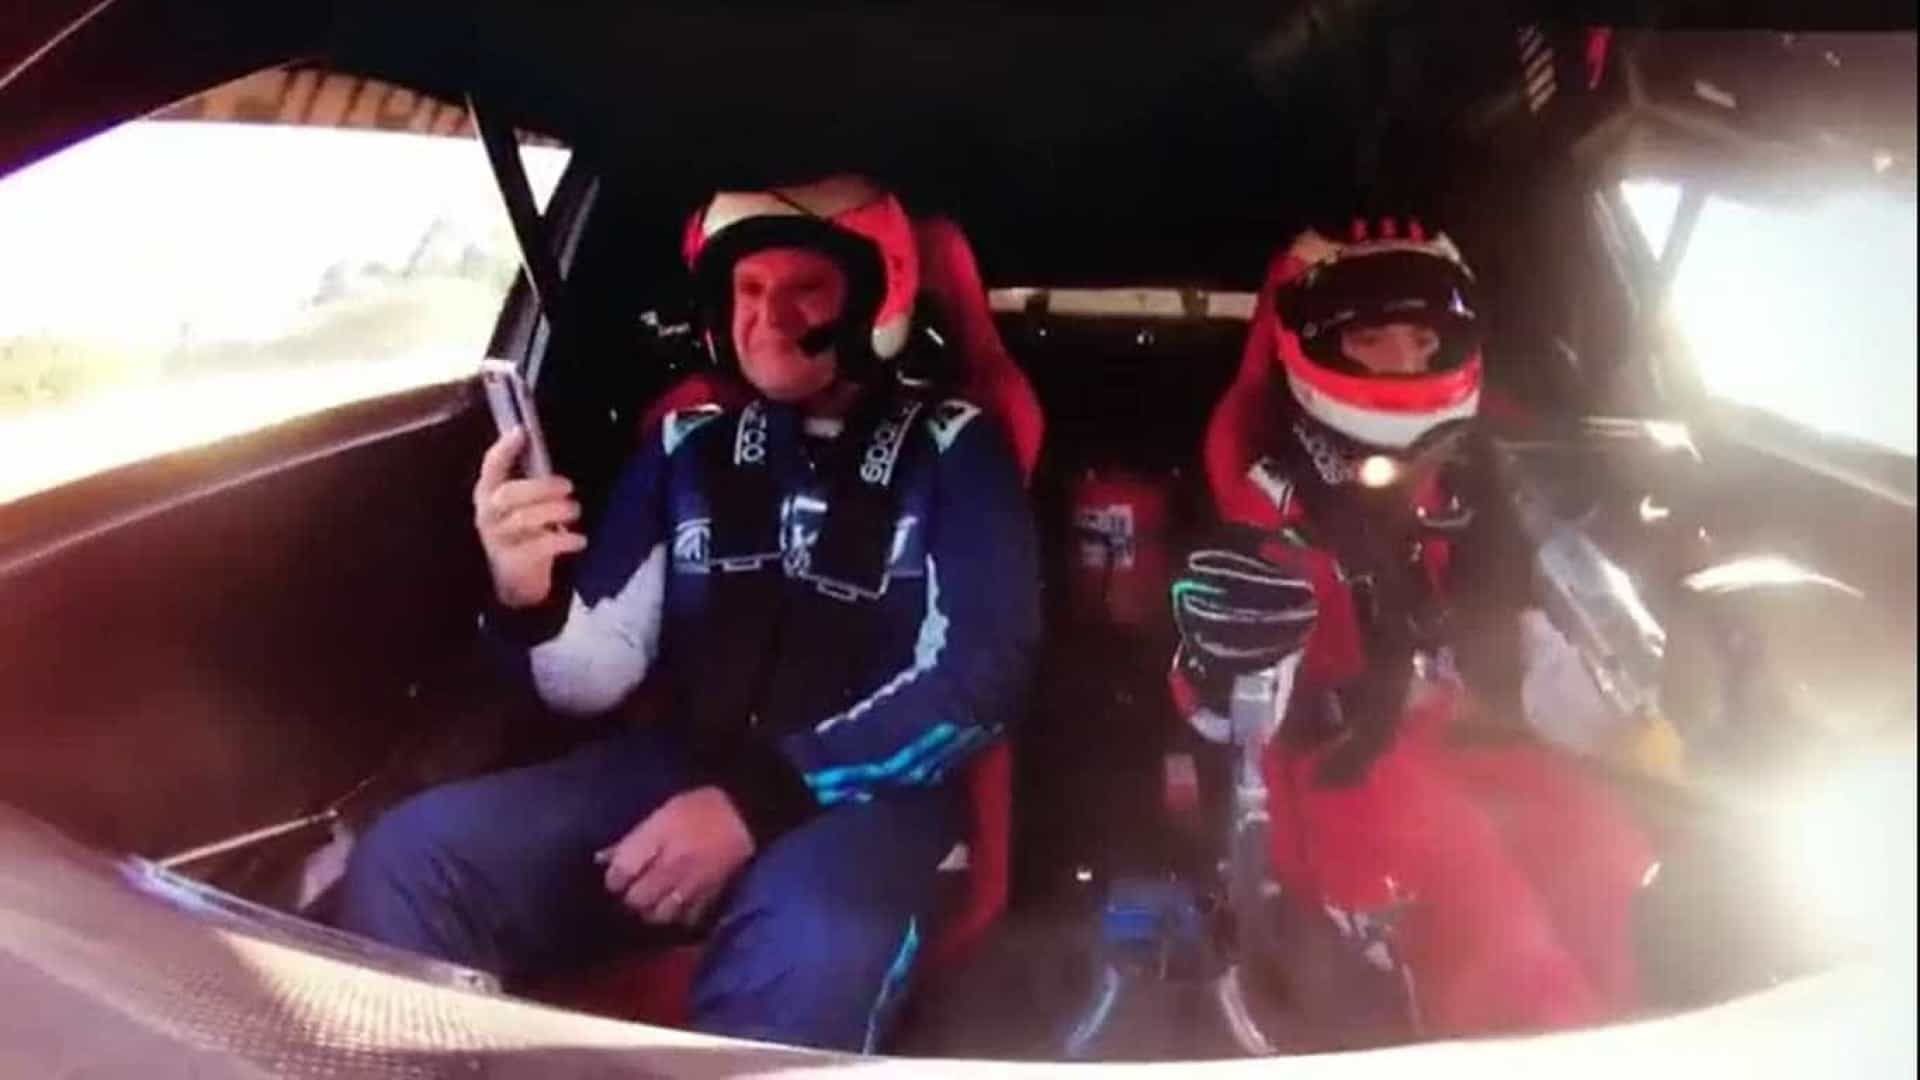 Barrichello se emociona ao andar como passageiro ao lado do filho